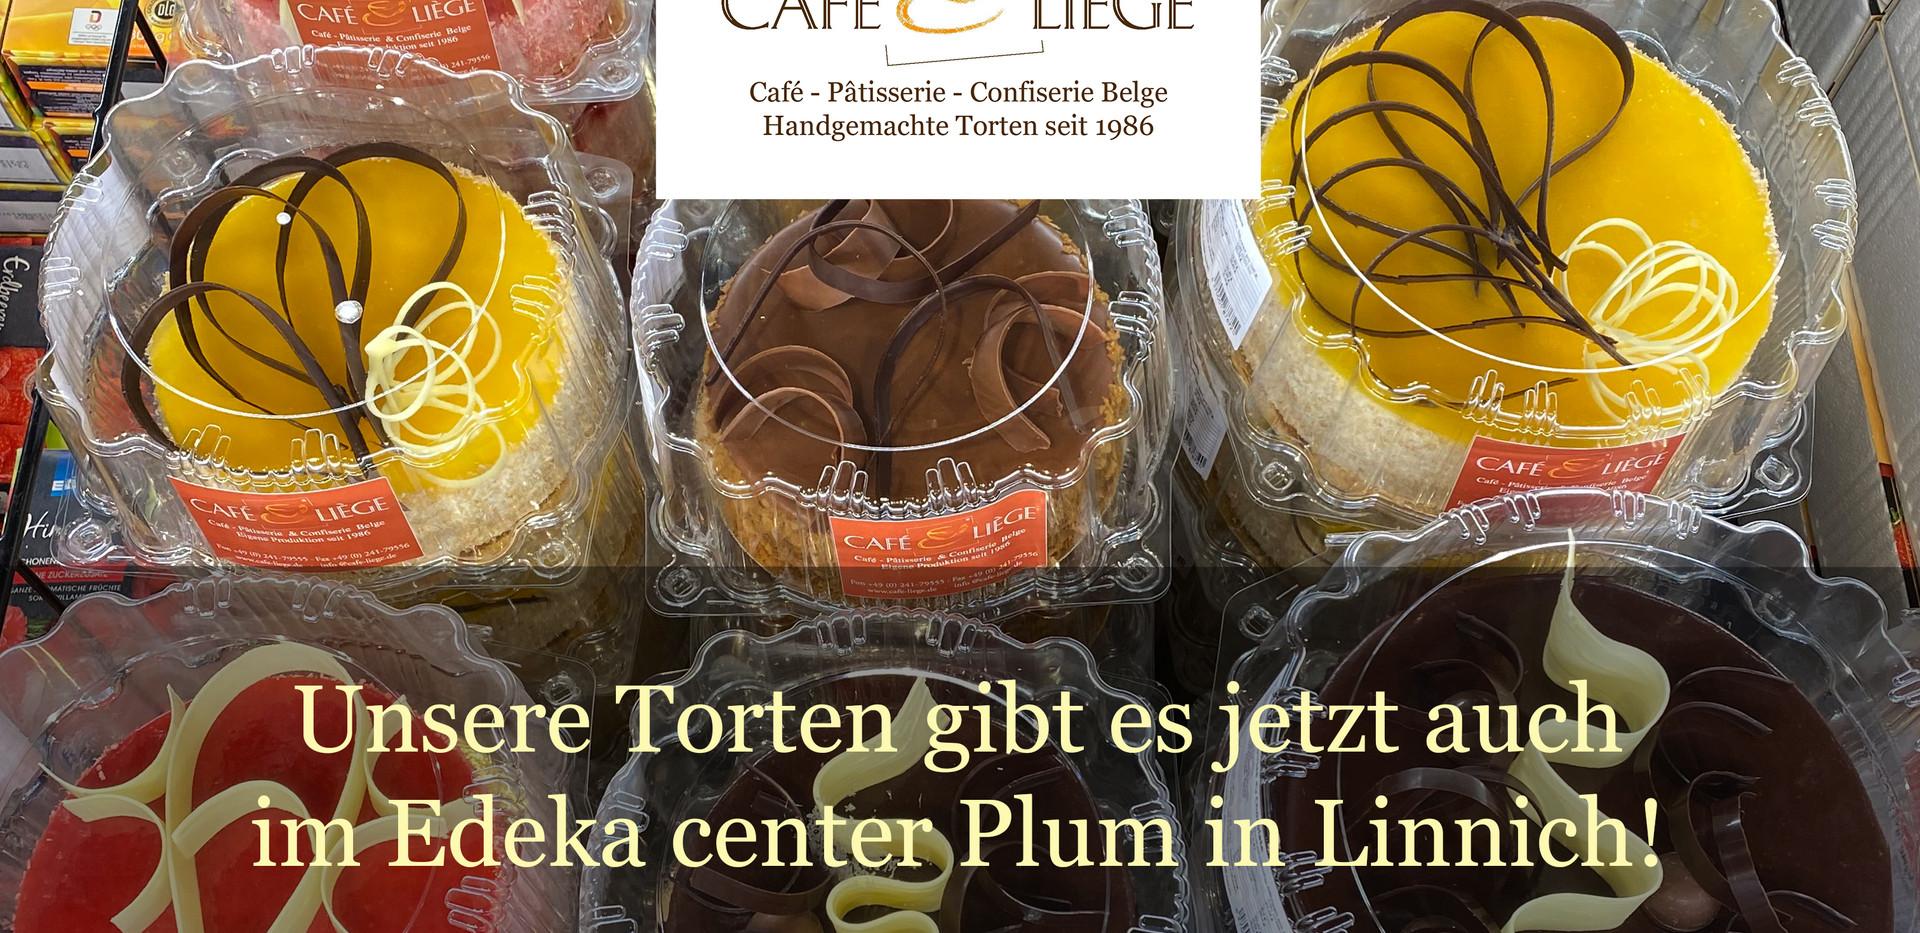 EDEKA center Plum in Linnich